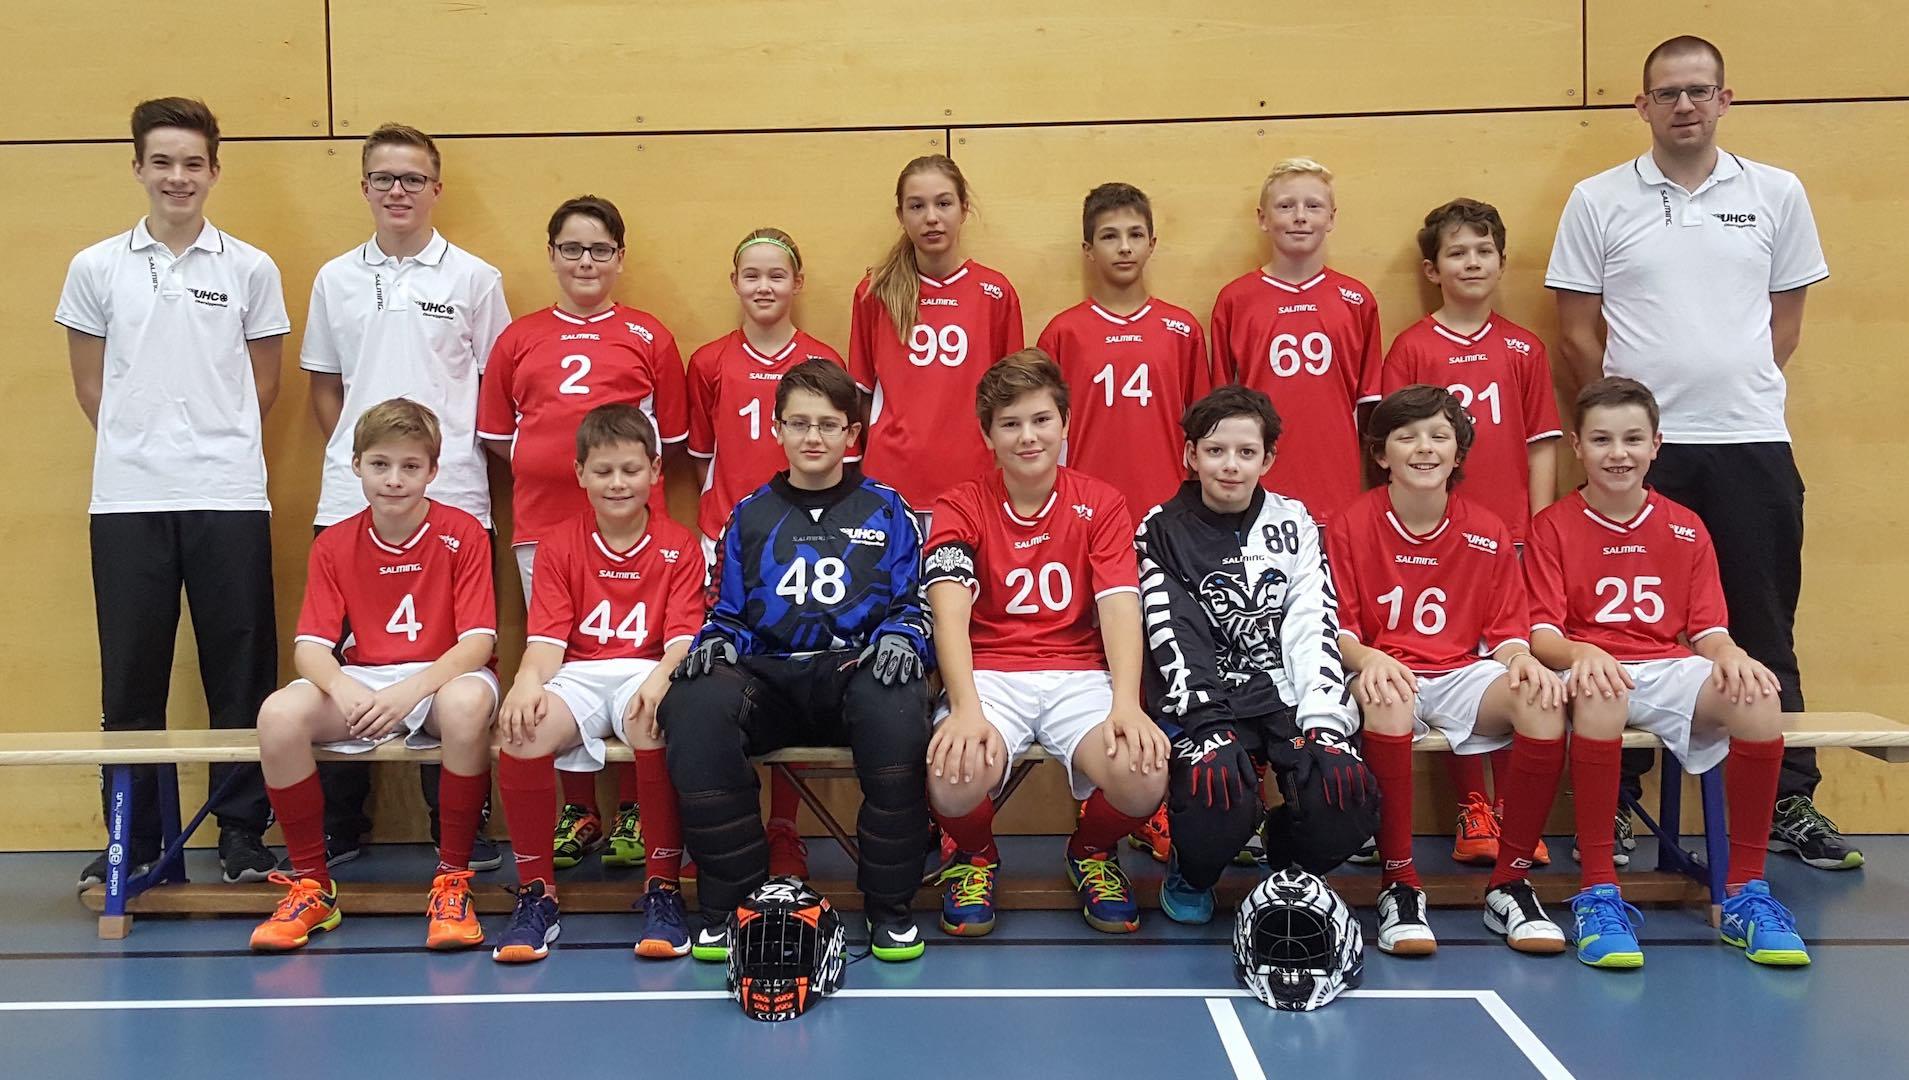 Teamfoto Junioren C 2017/18